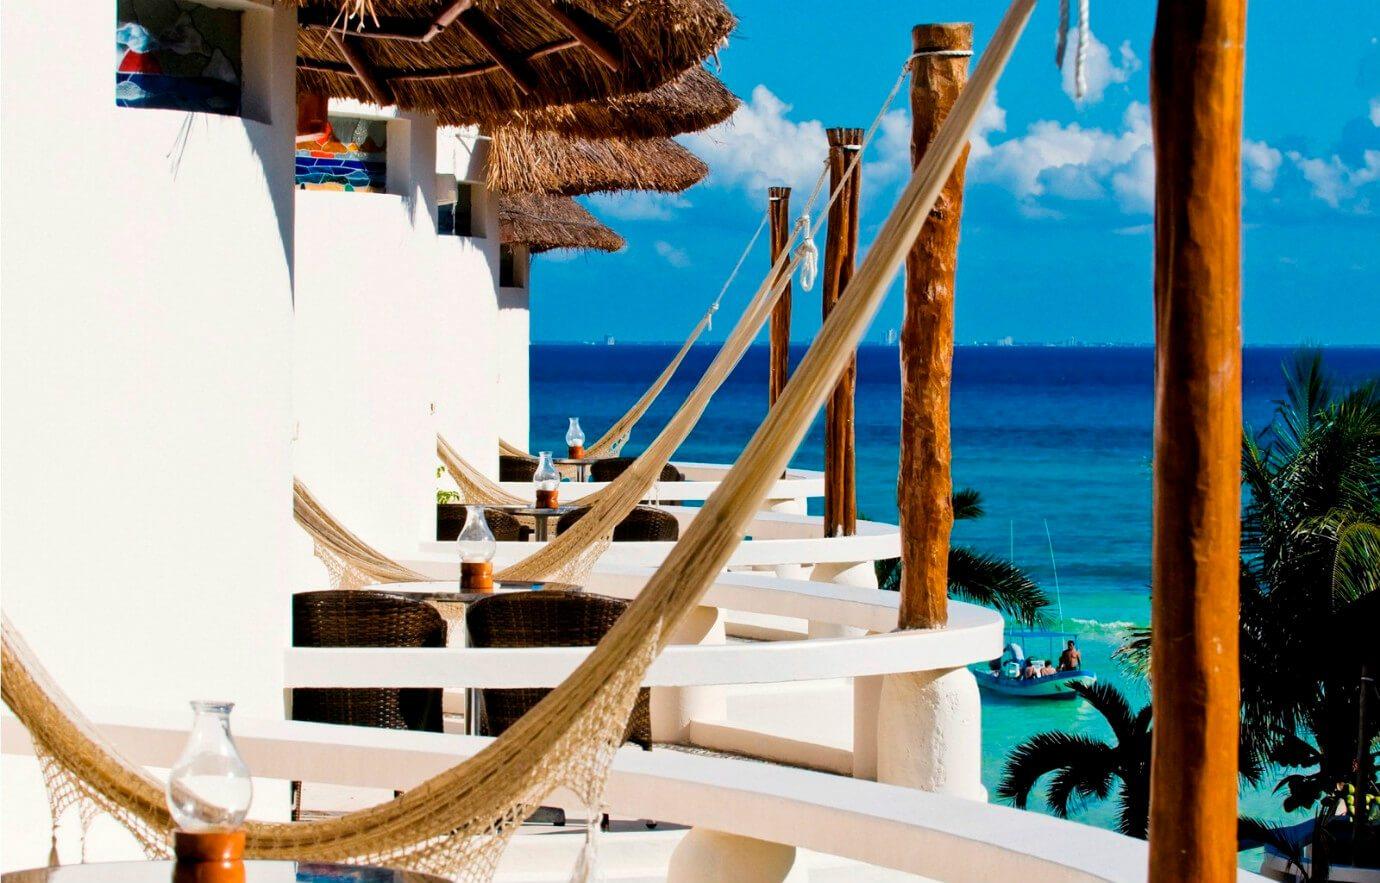 10 wonderful playa del carmen boutique hotels for Best boutique hotels playa del carmen